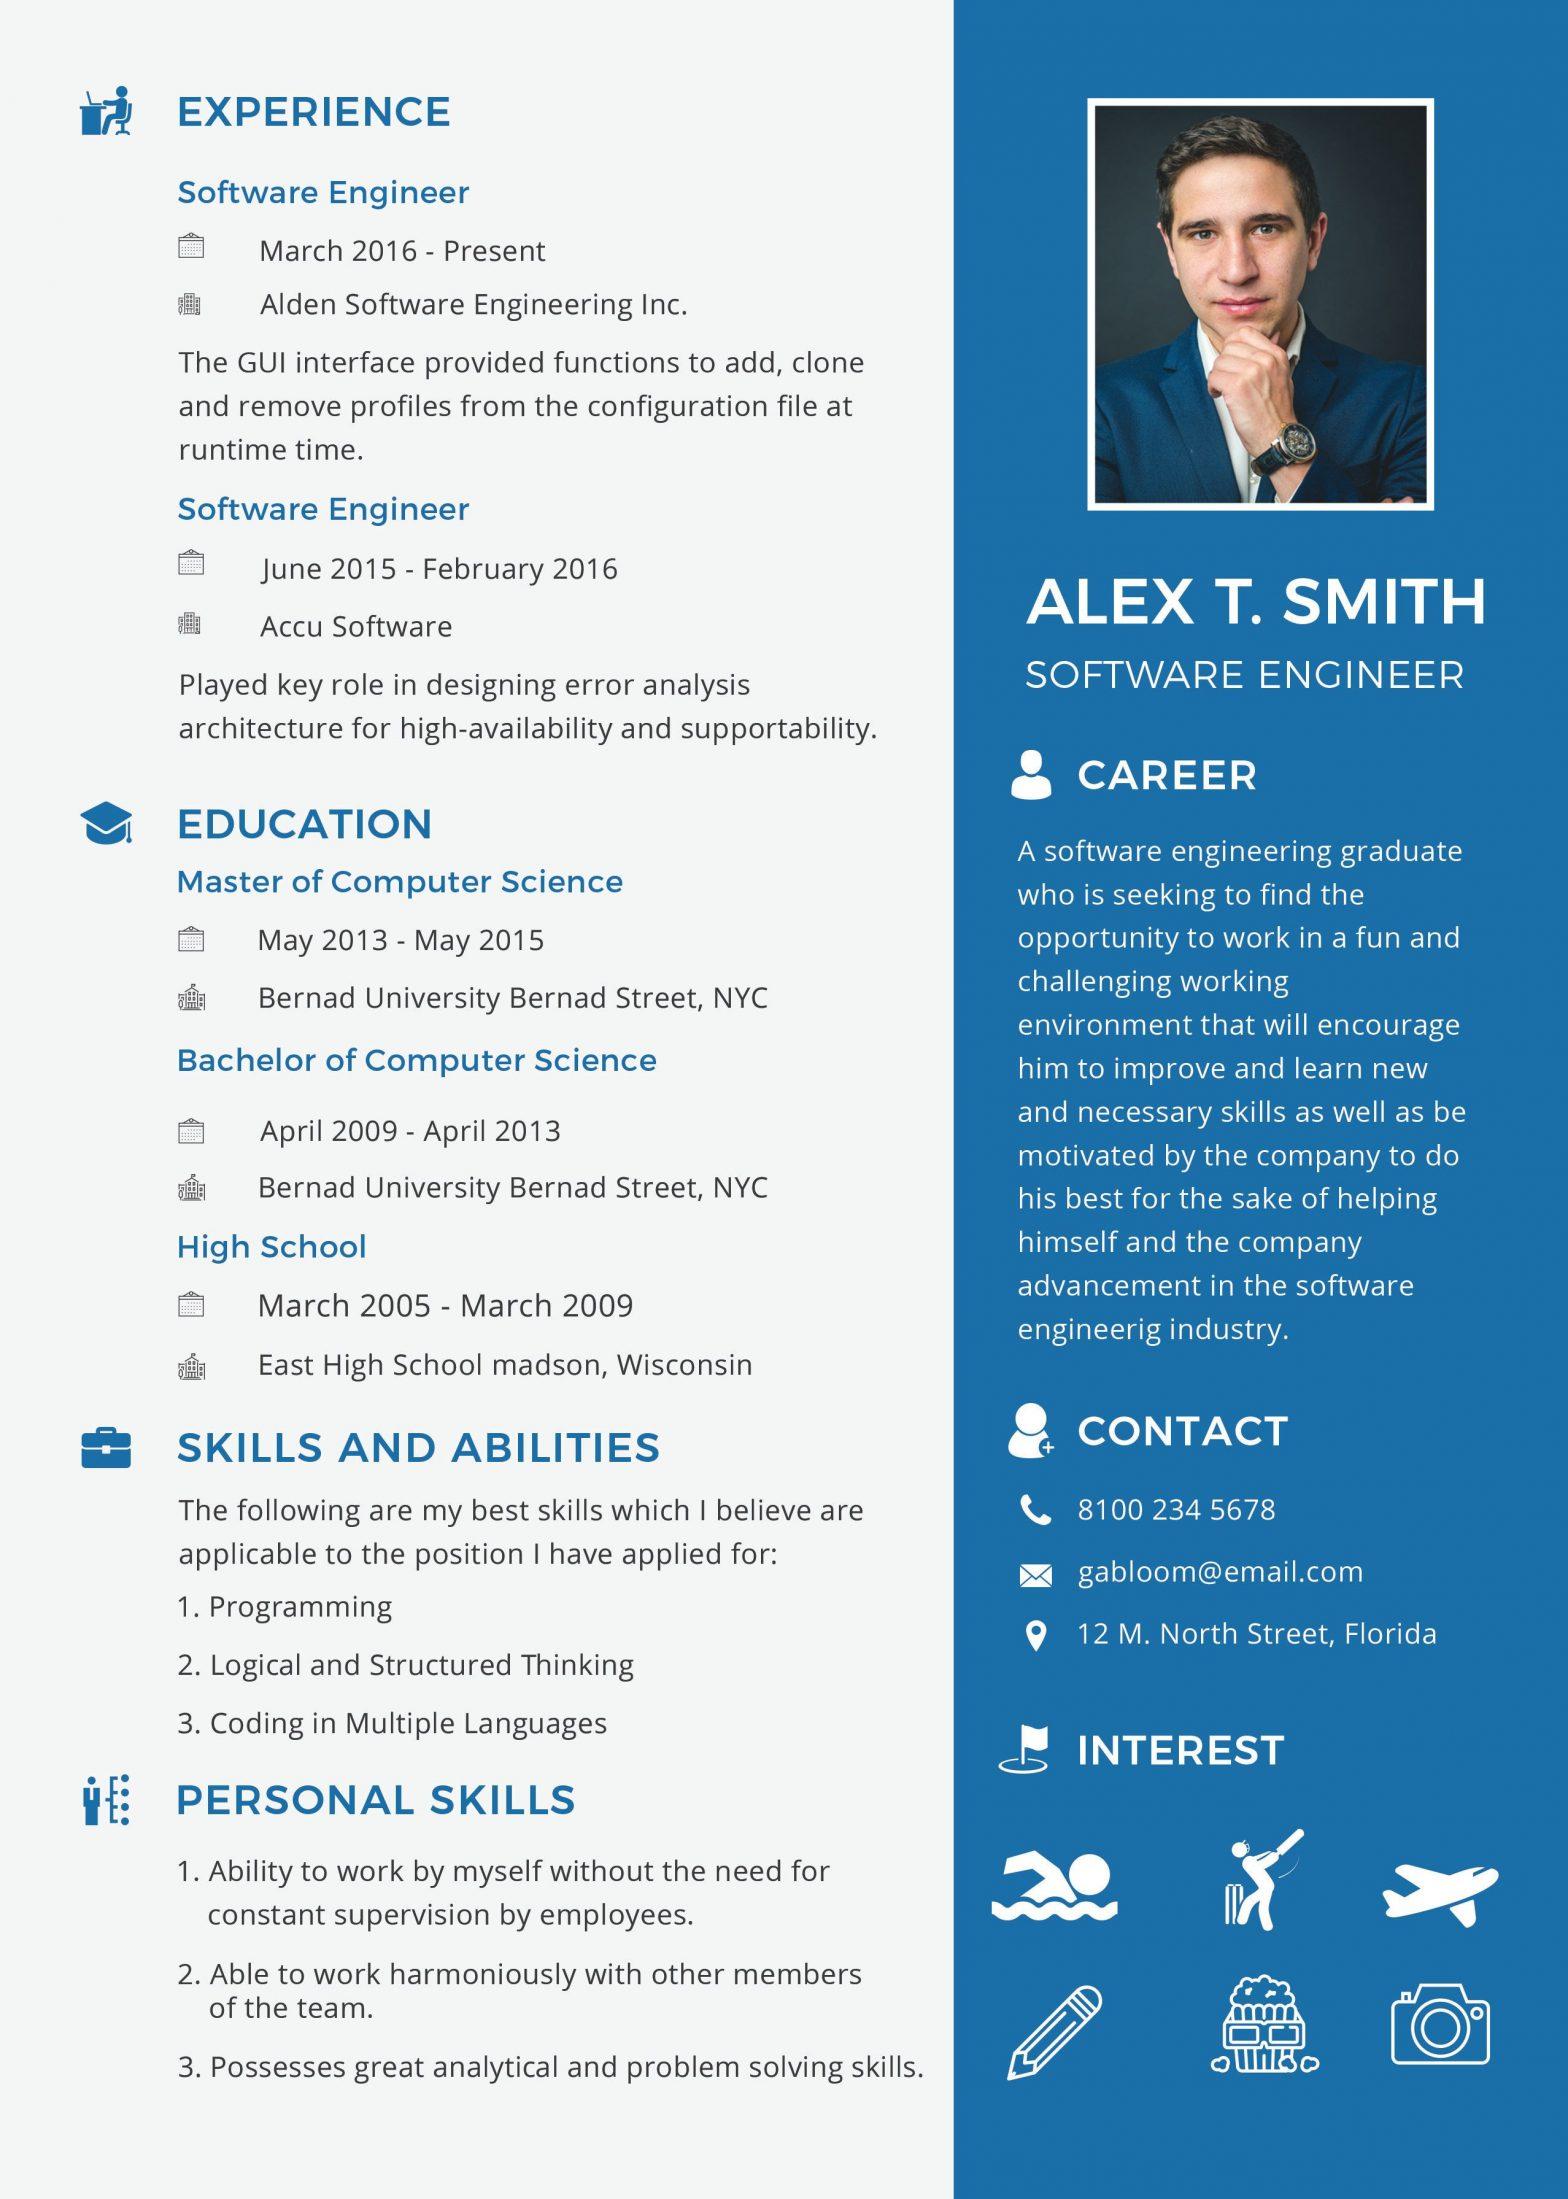 Fresher software Engineer Resume Sample Doc Resume for software Engineer Fresher Template Engineering Resume ...